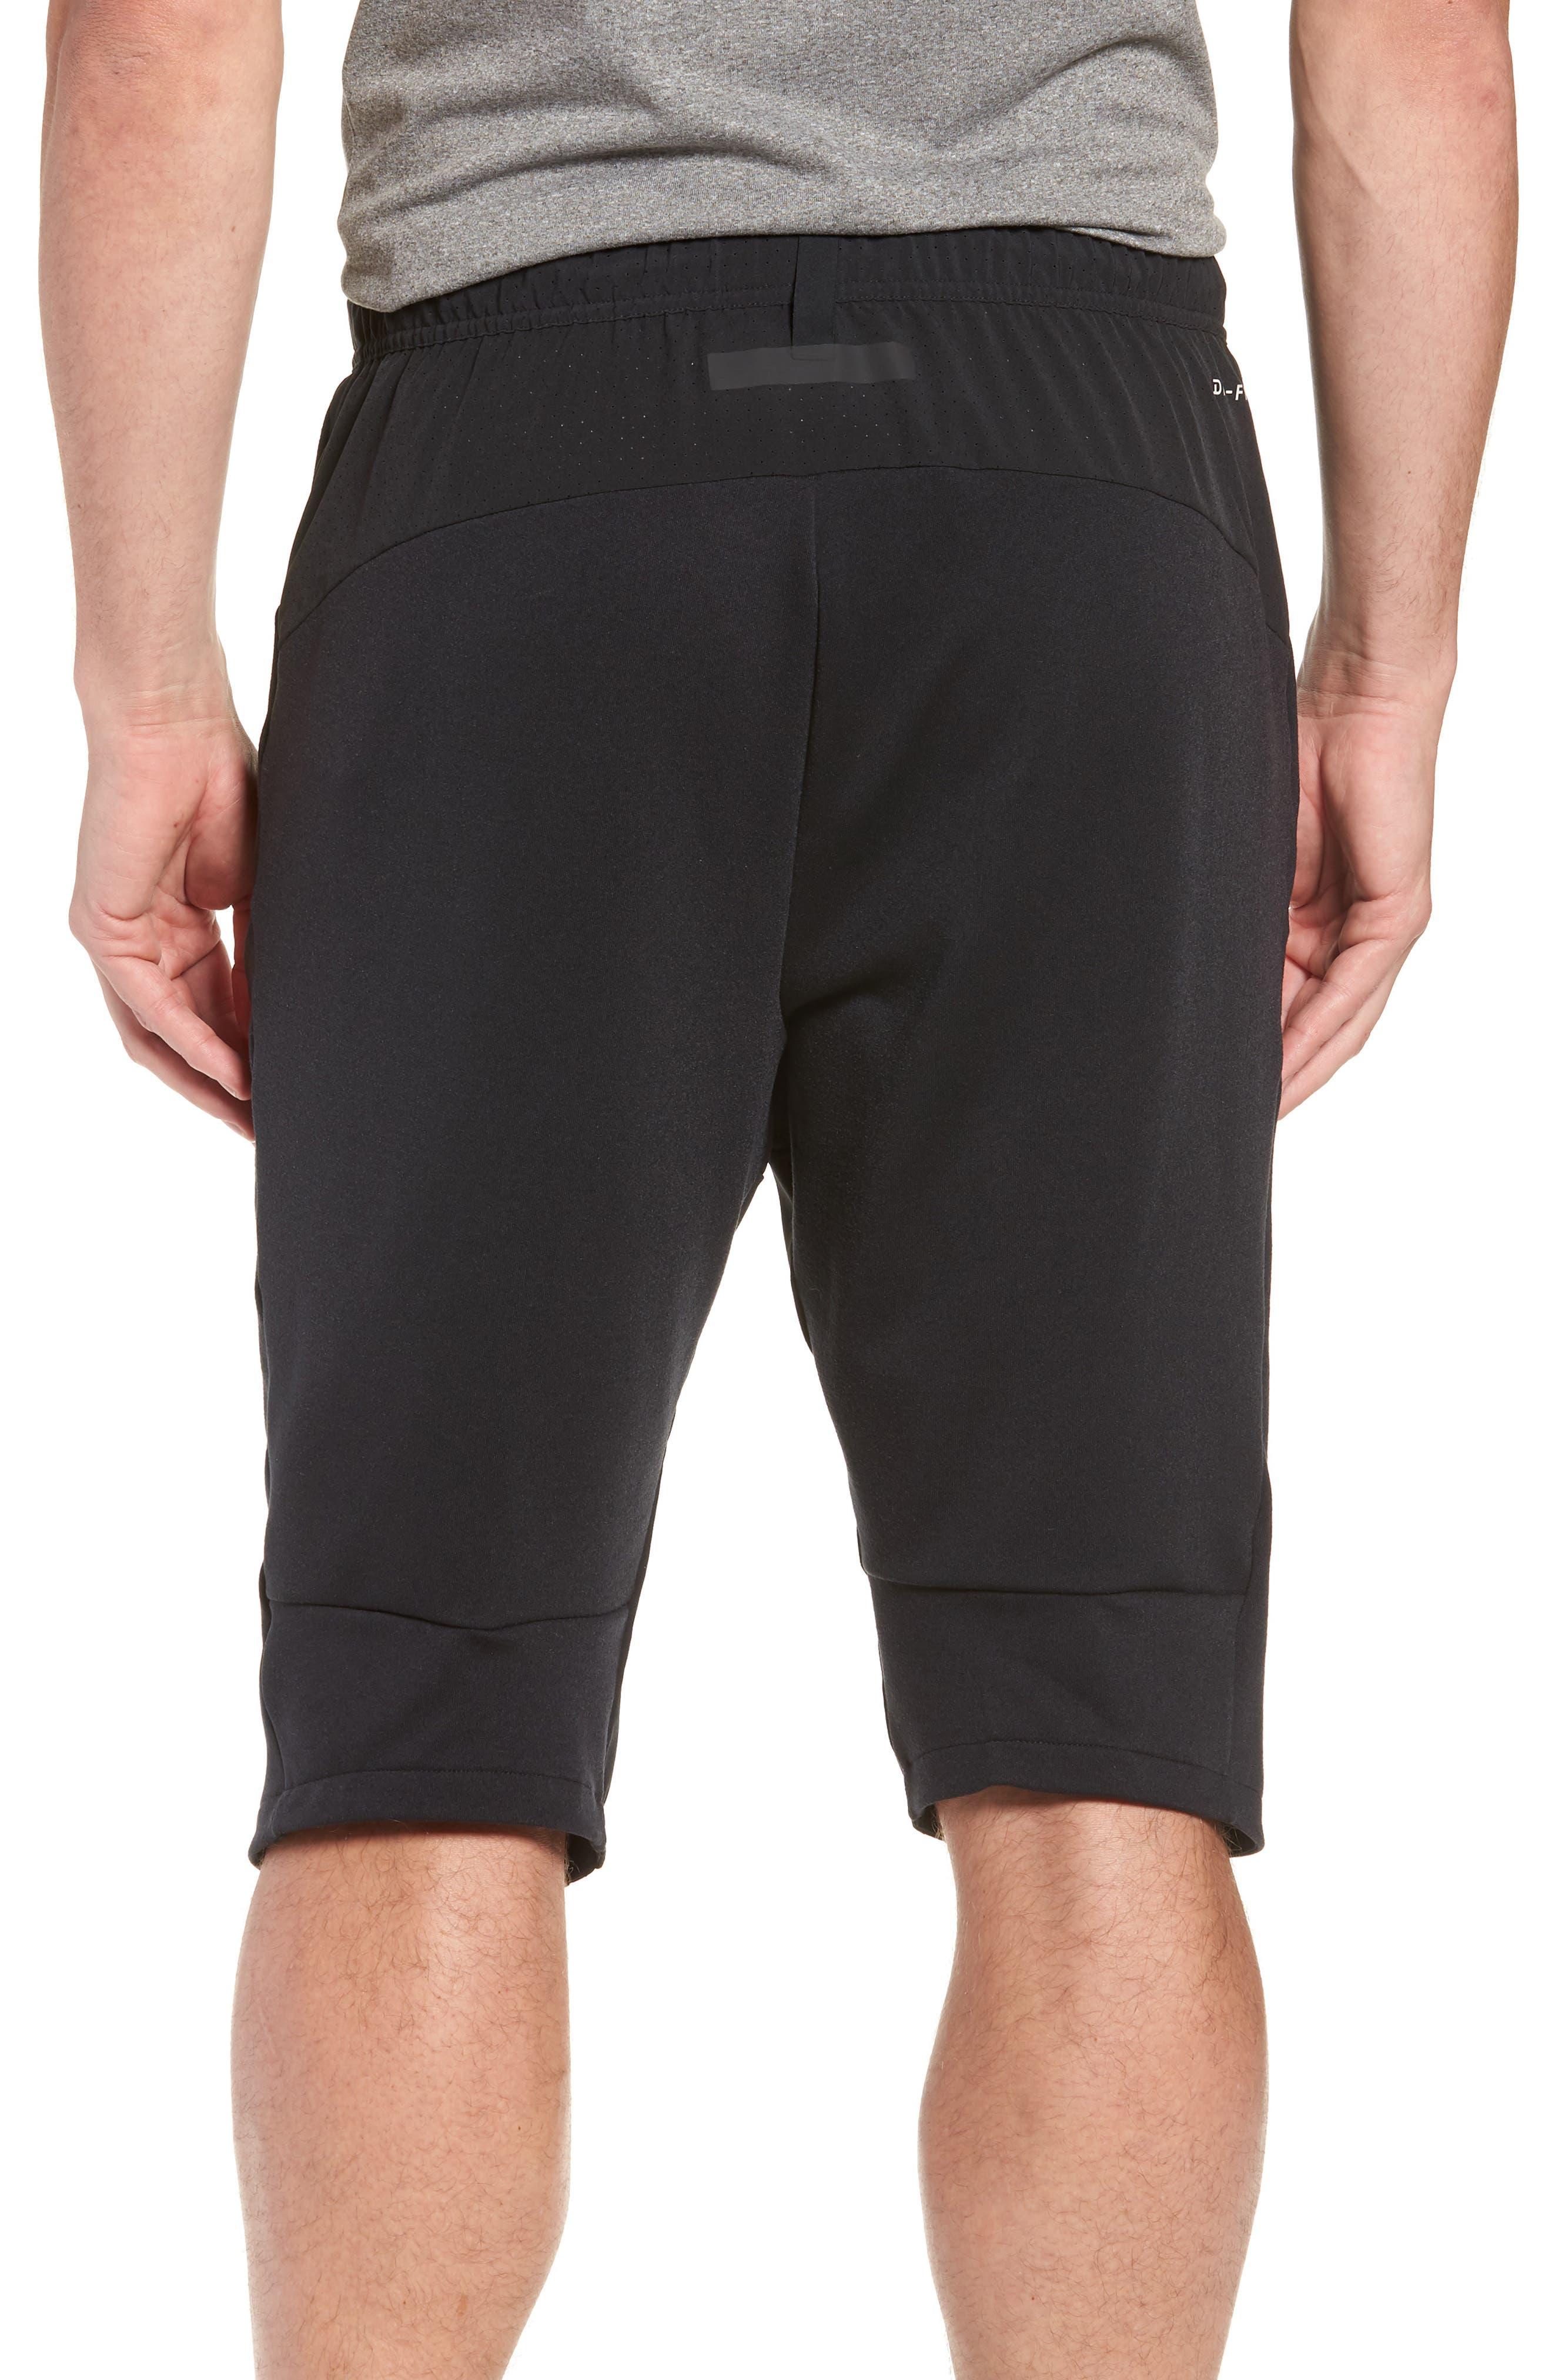 Dry Max Training Shorts,                             Alternate thumbnail 2, color,                             010